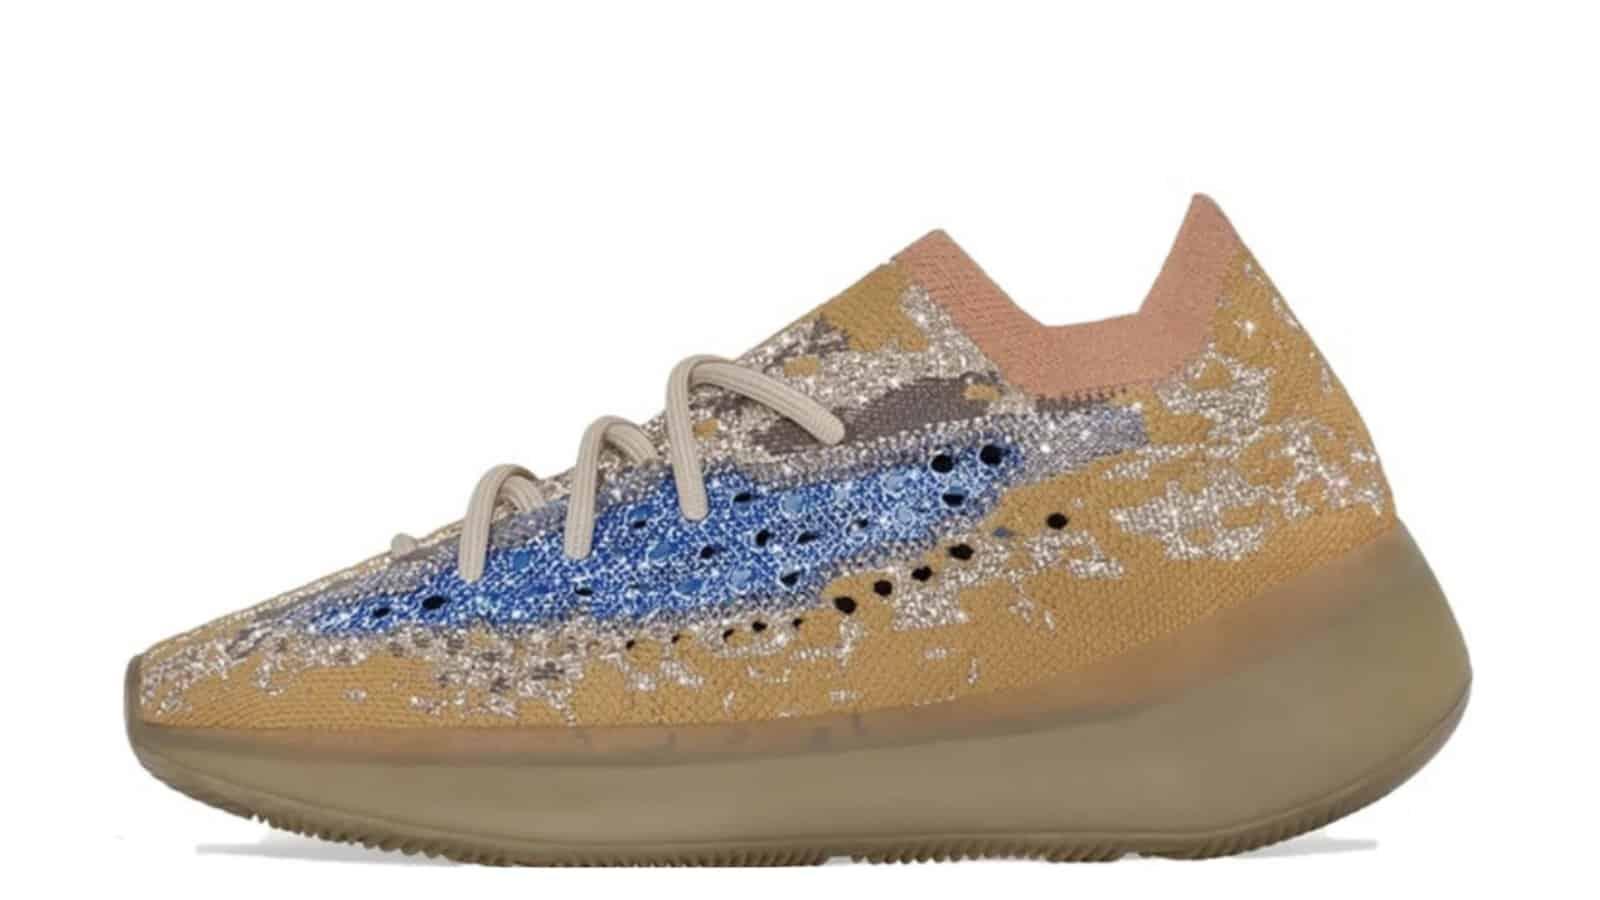 Adidas Yeezy Boost 380 Blue Oat Reflective FX9847